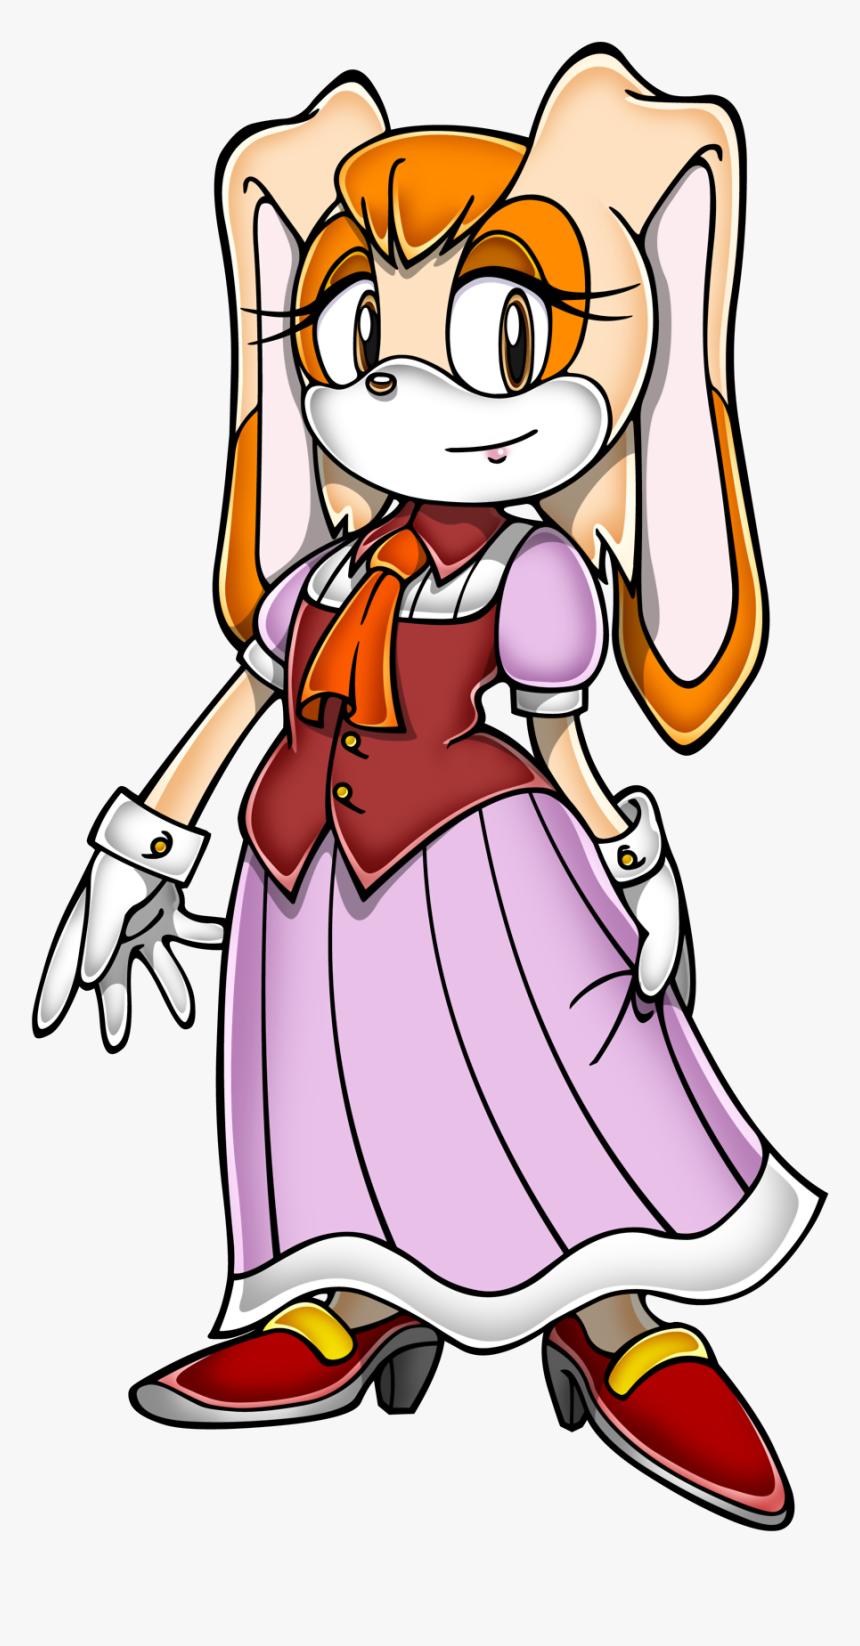 Vanilla The Rabbit, HD Png Download, Free Download